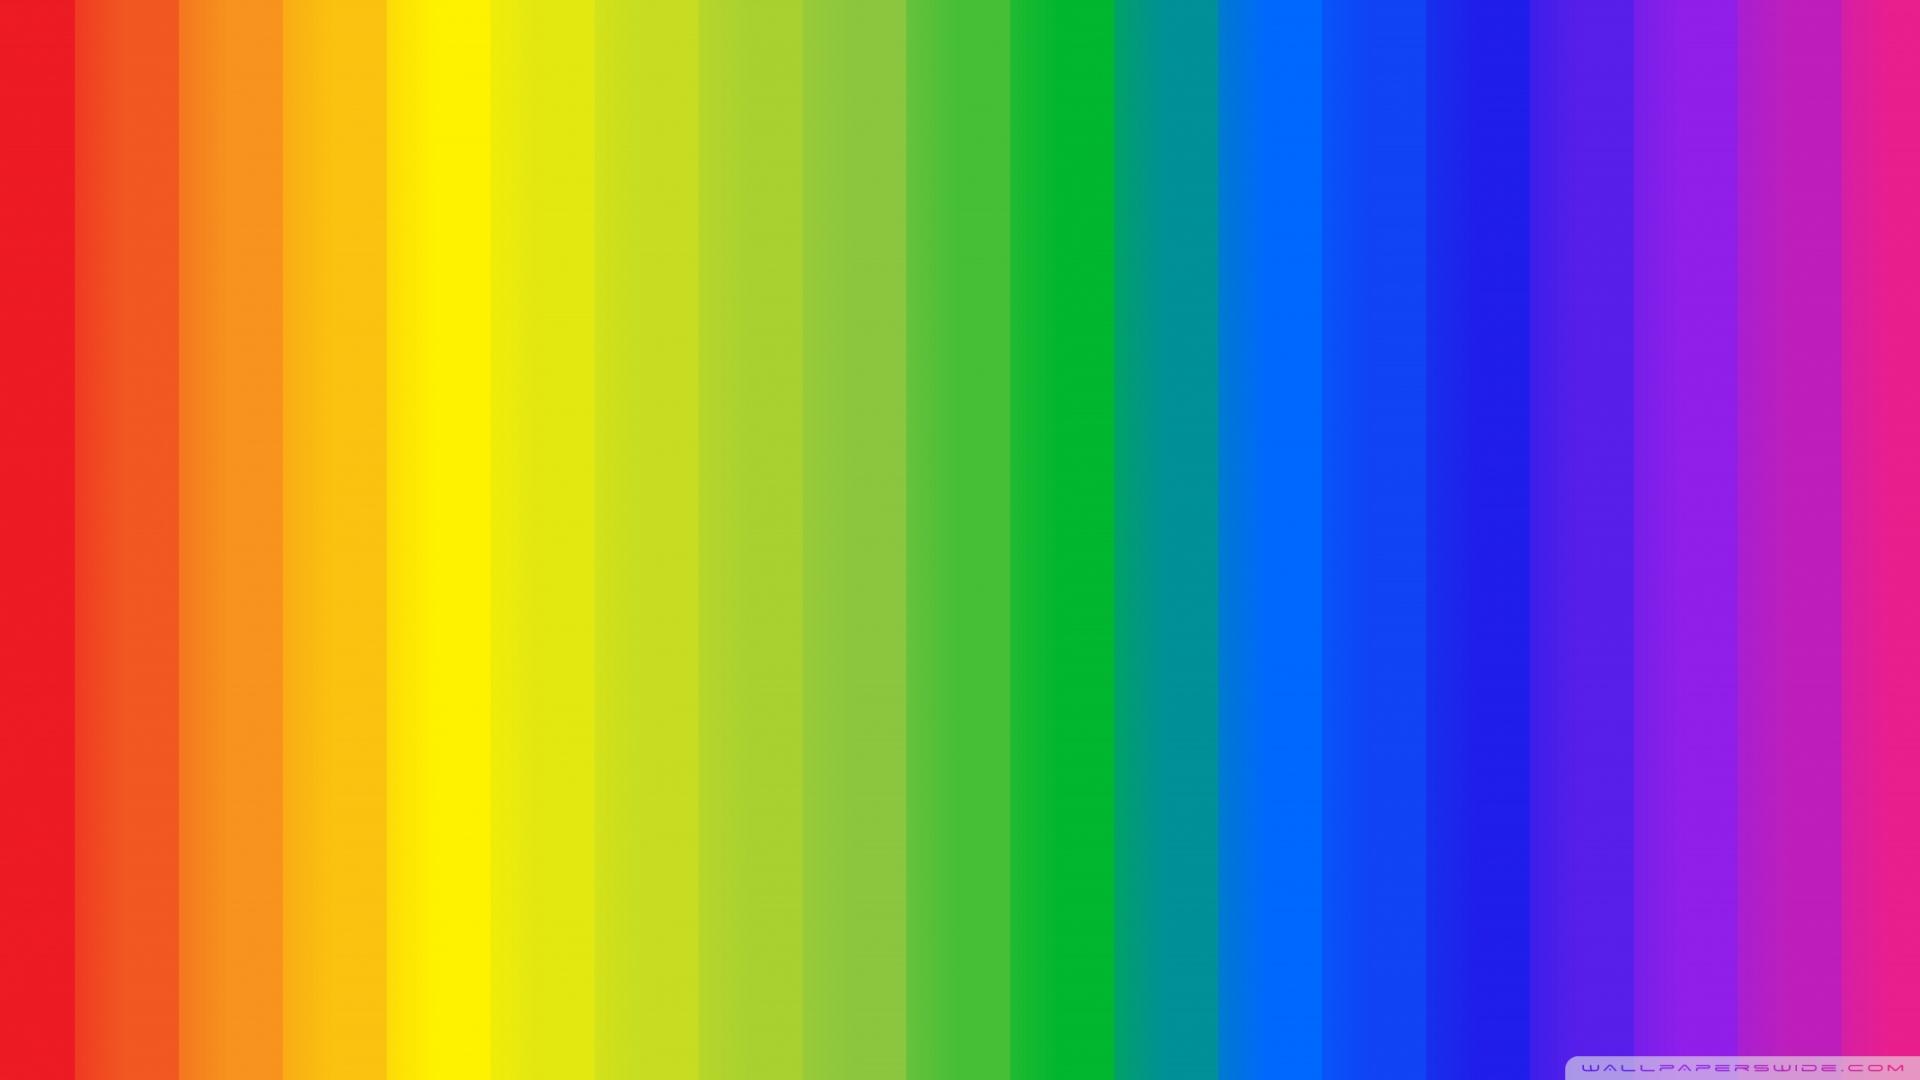 Fall Hd Wallpapers 1080p Widescreen Rainbow 8 4k Hd Desktop Wallpaper For 4k Ultra Hd Tv